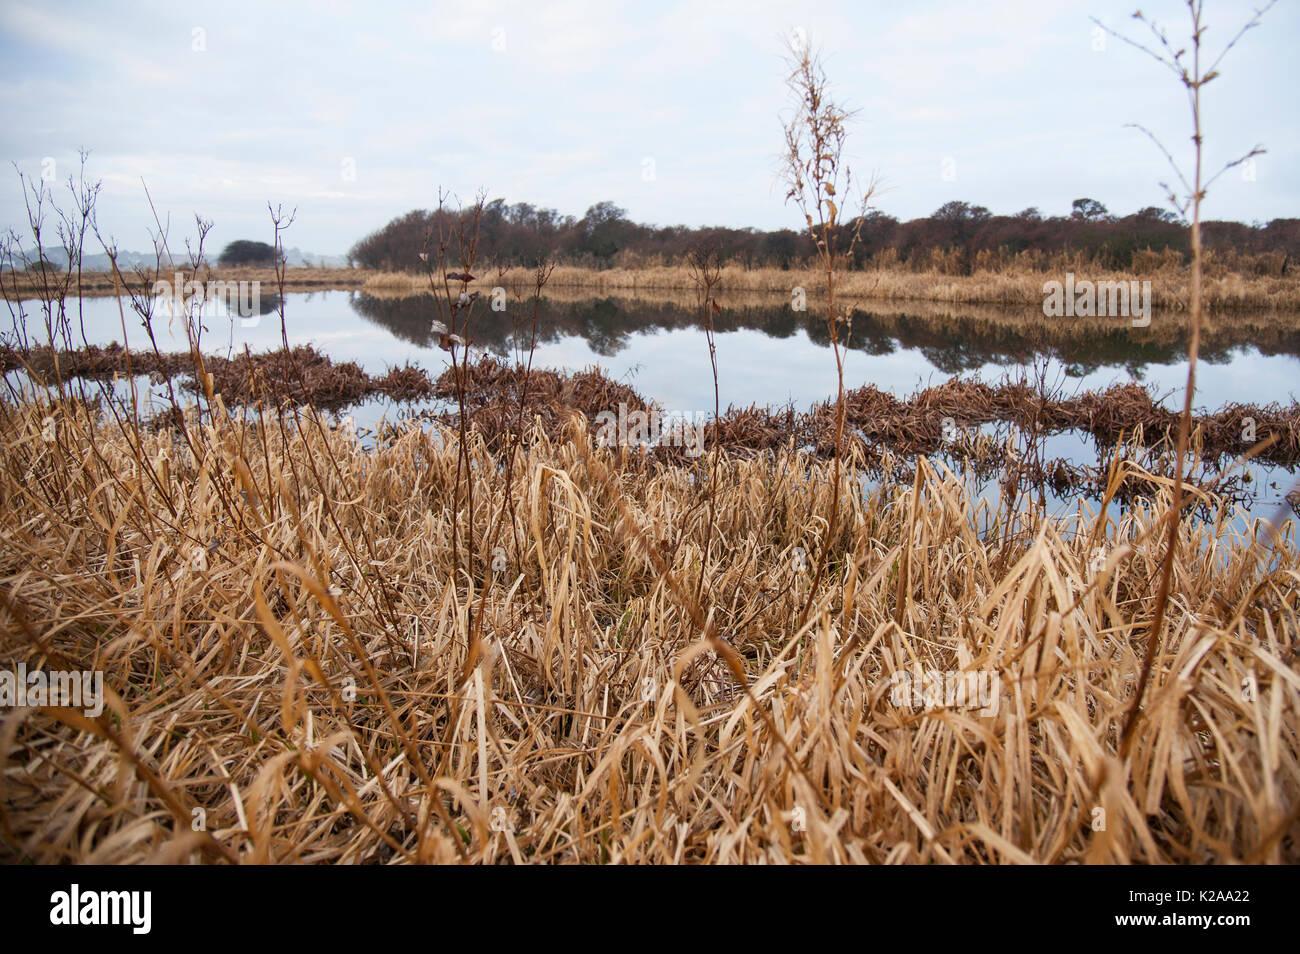 Freshwater loch, Aberlady Bay nature reserve. - Stock Image